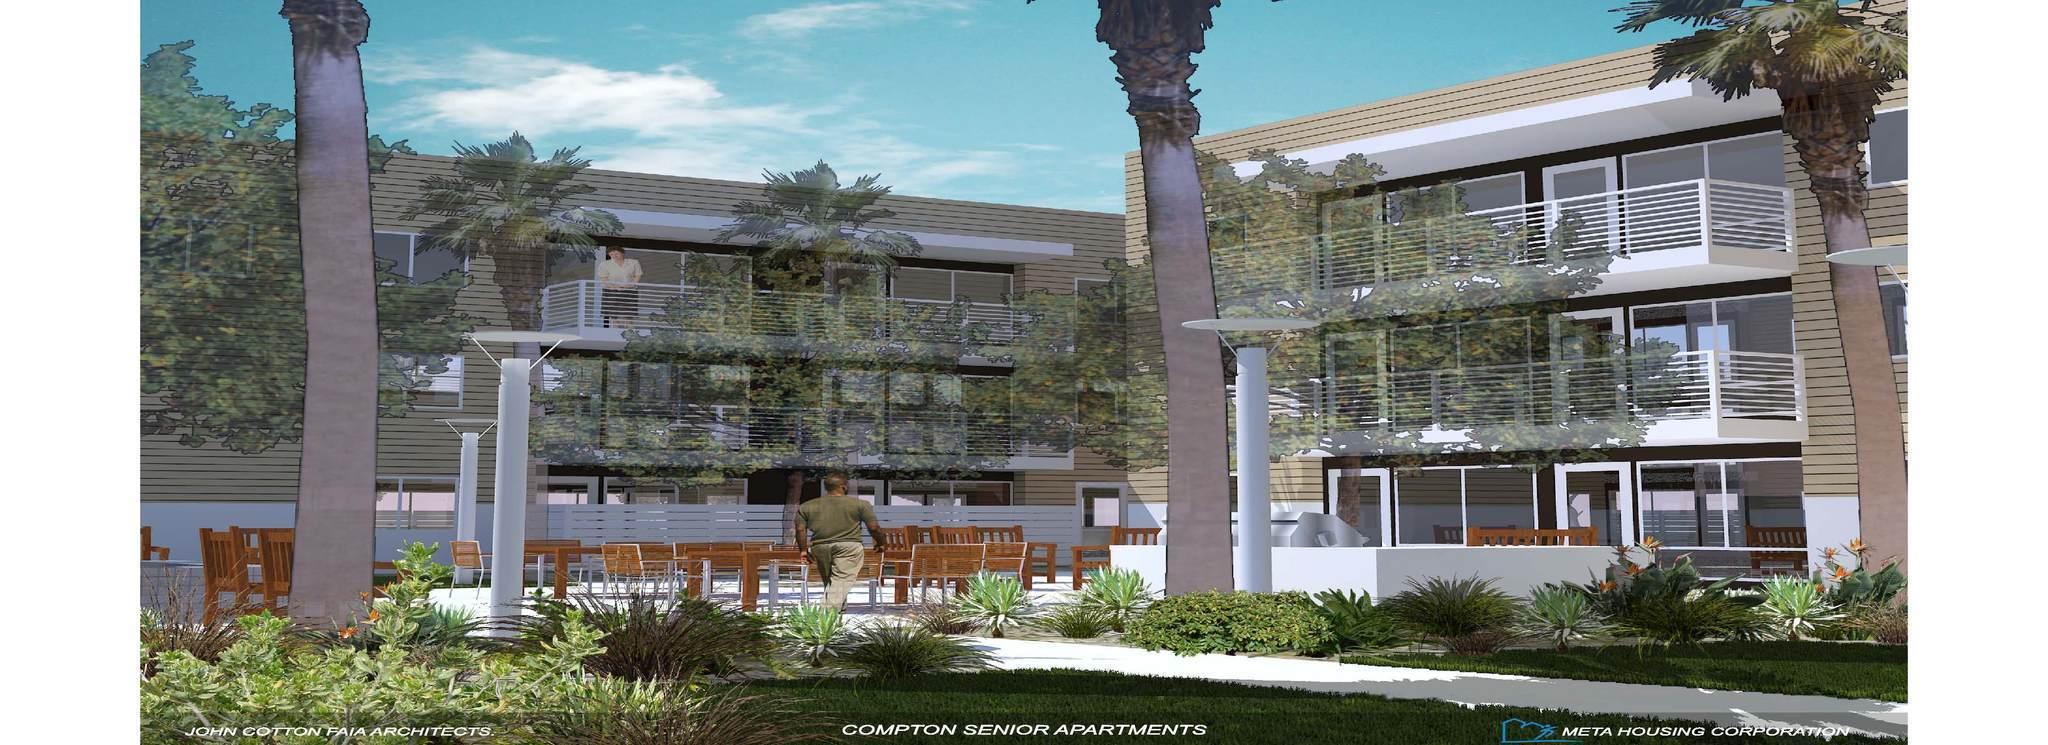 Senior Housing Complex Being Built Near Compton Transit Stops